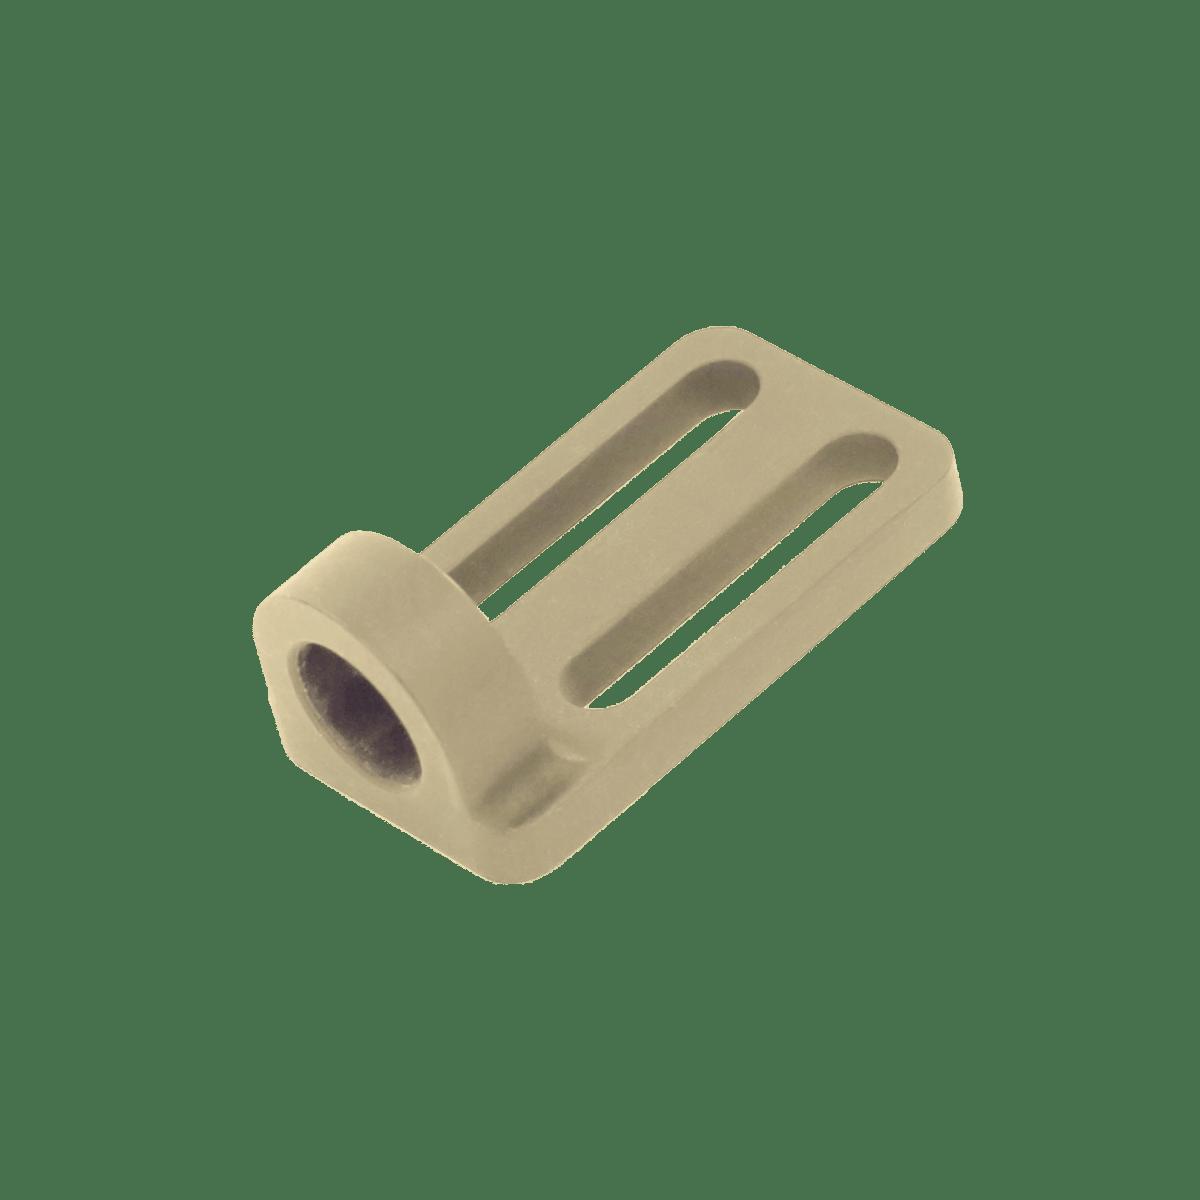 ferro concepts fde qd sling mount 1913 picatinny rail